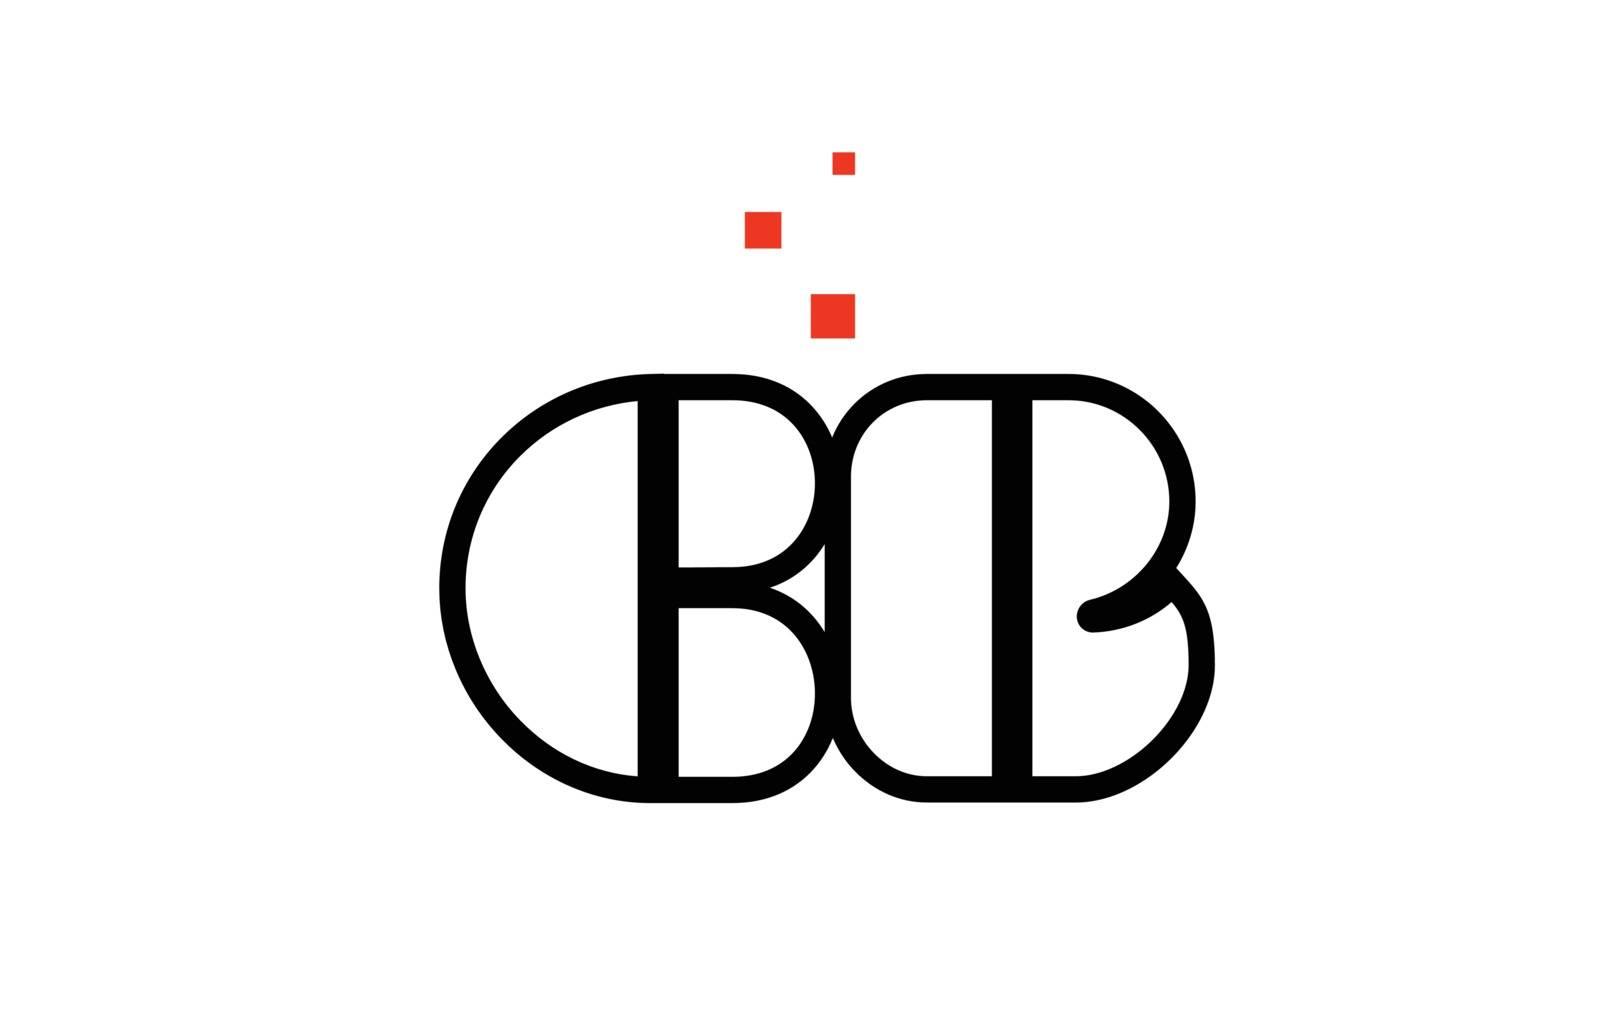 CB C B black white red alphabet letter combination logo icon des by dragomirescu